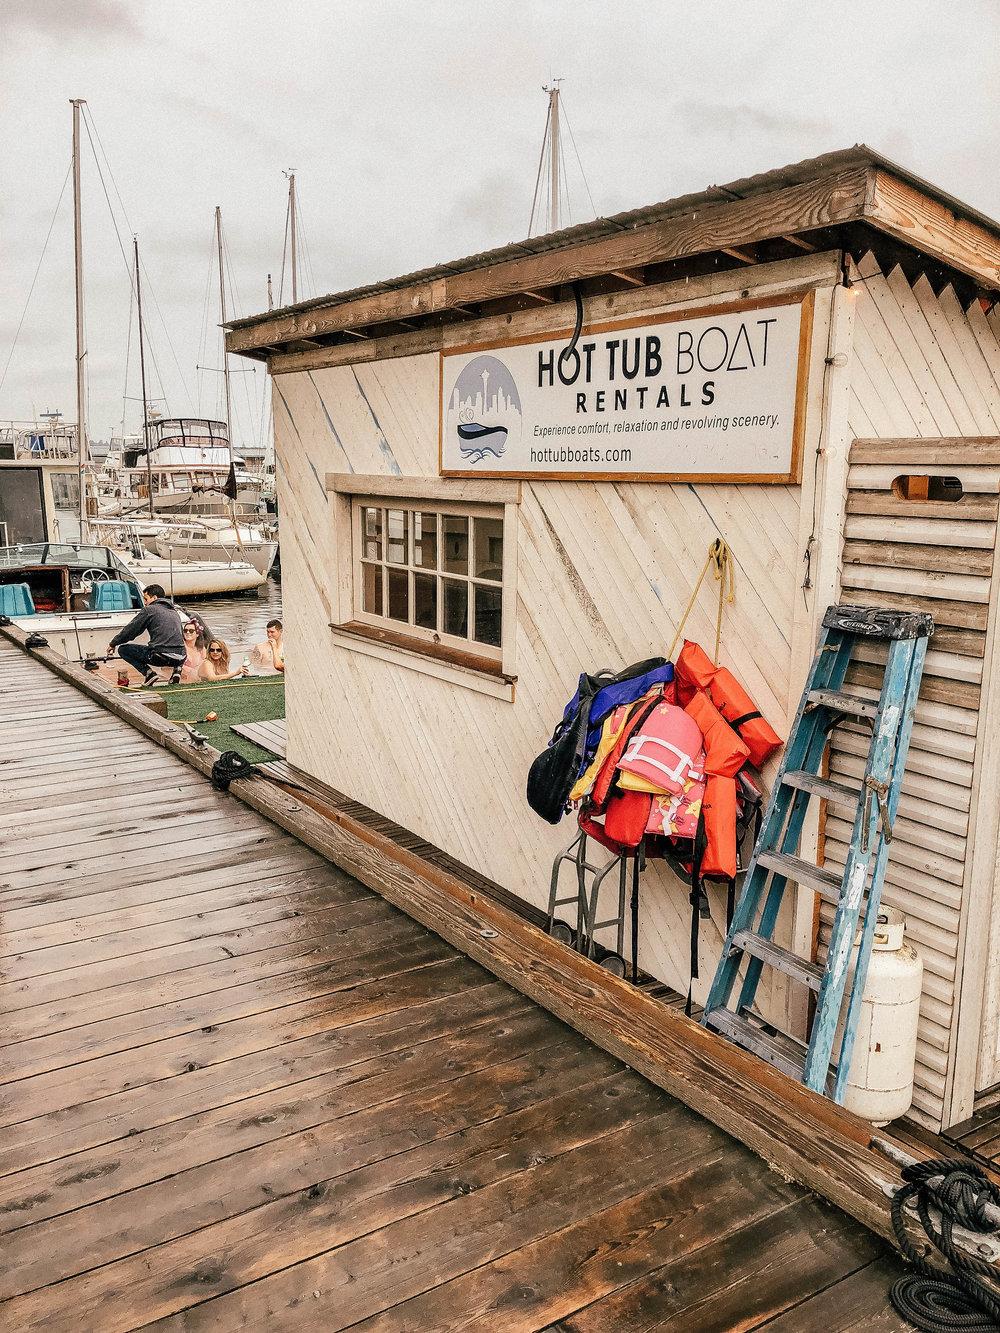 hottub_boat_rental.jpg